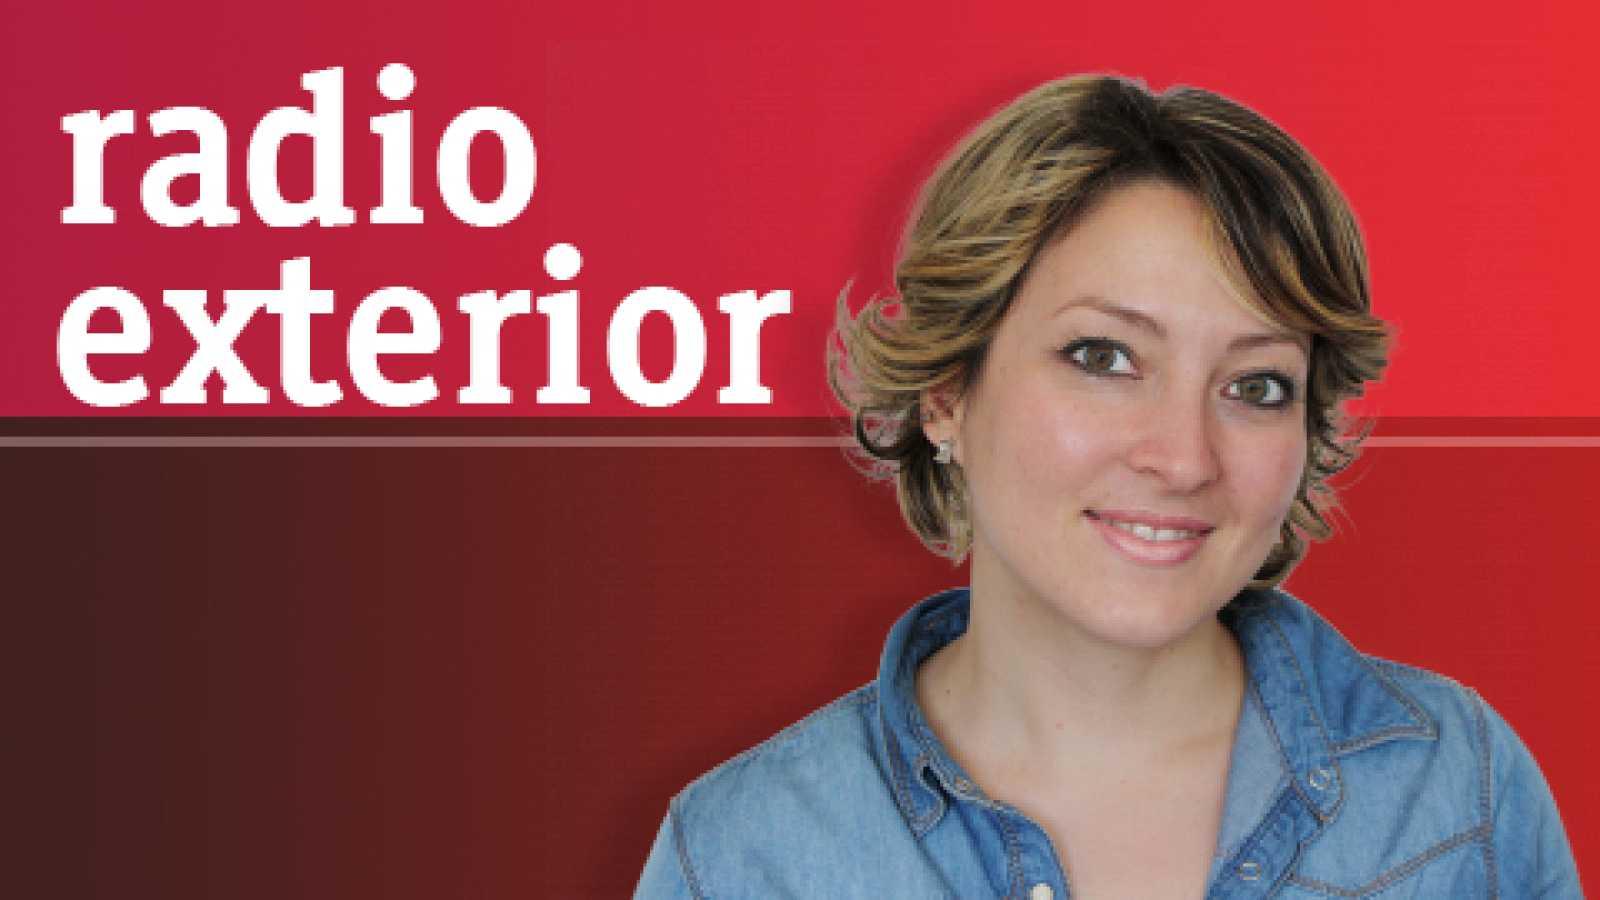 Cultura con Ñ - Magia en Zamora - 07/09/19 - escuchar ahora